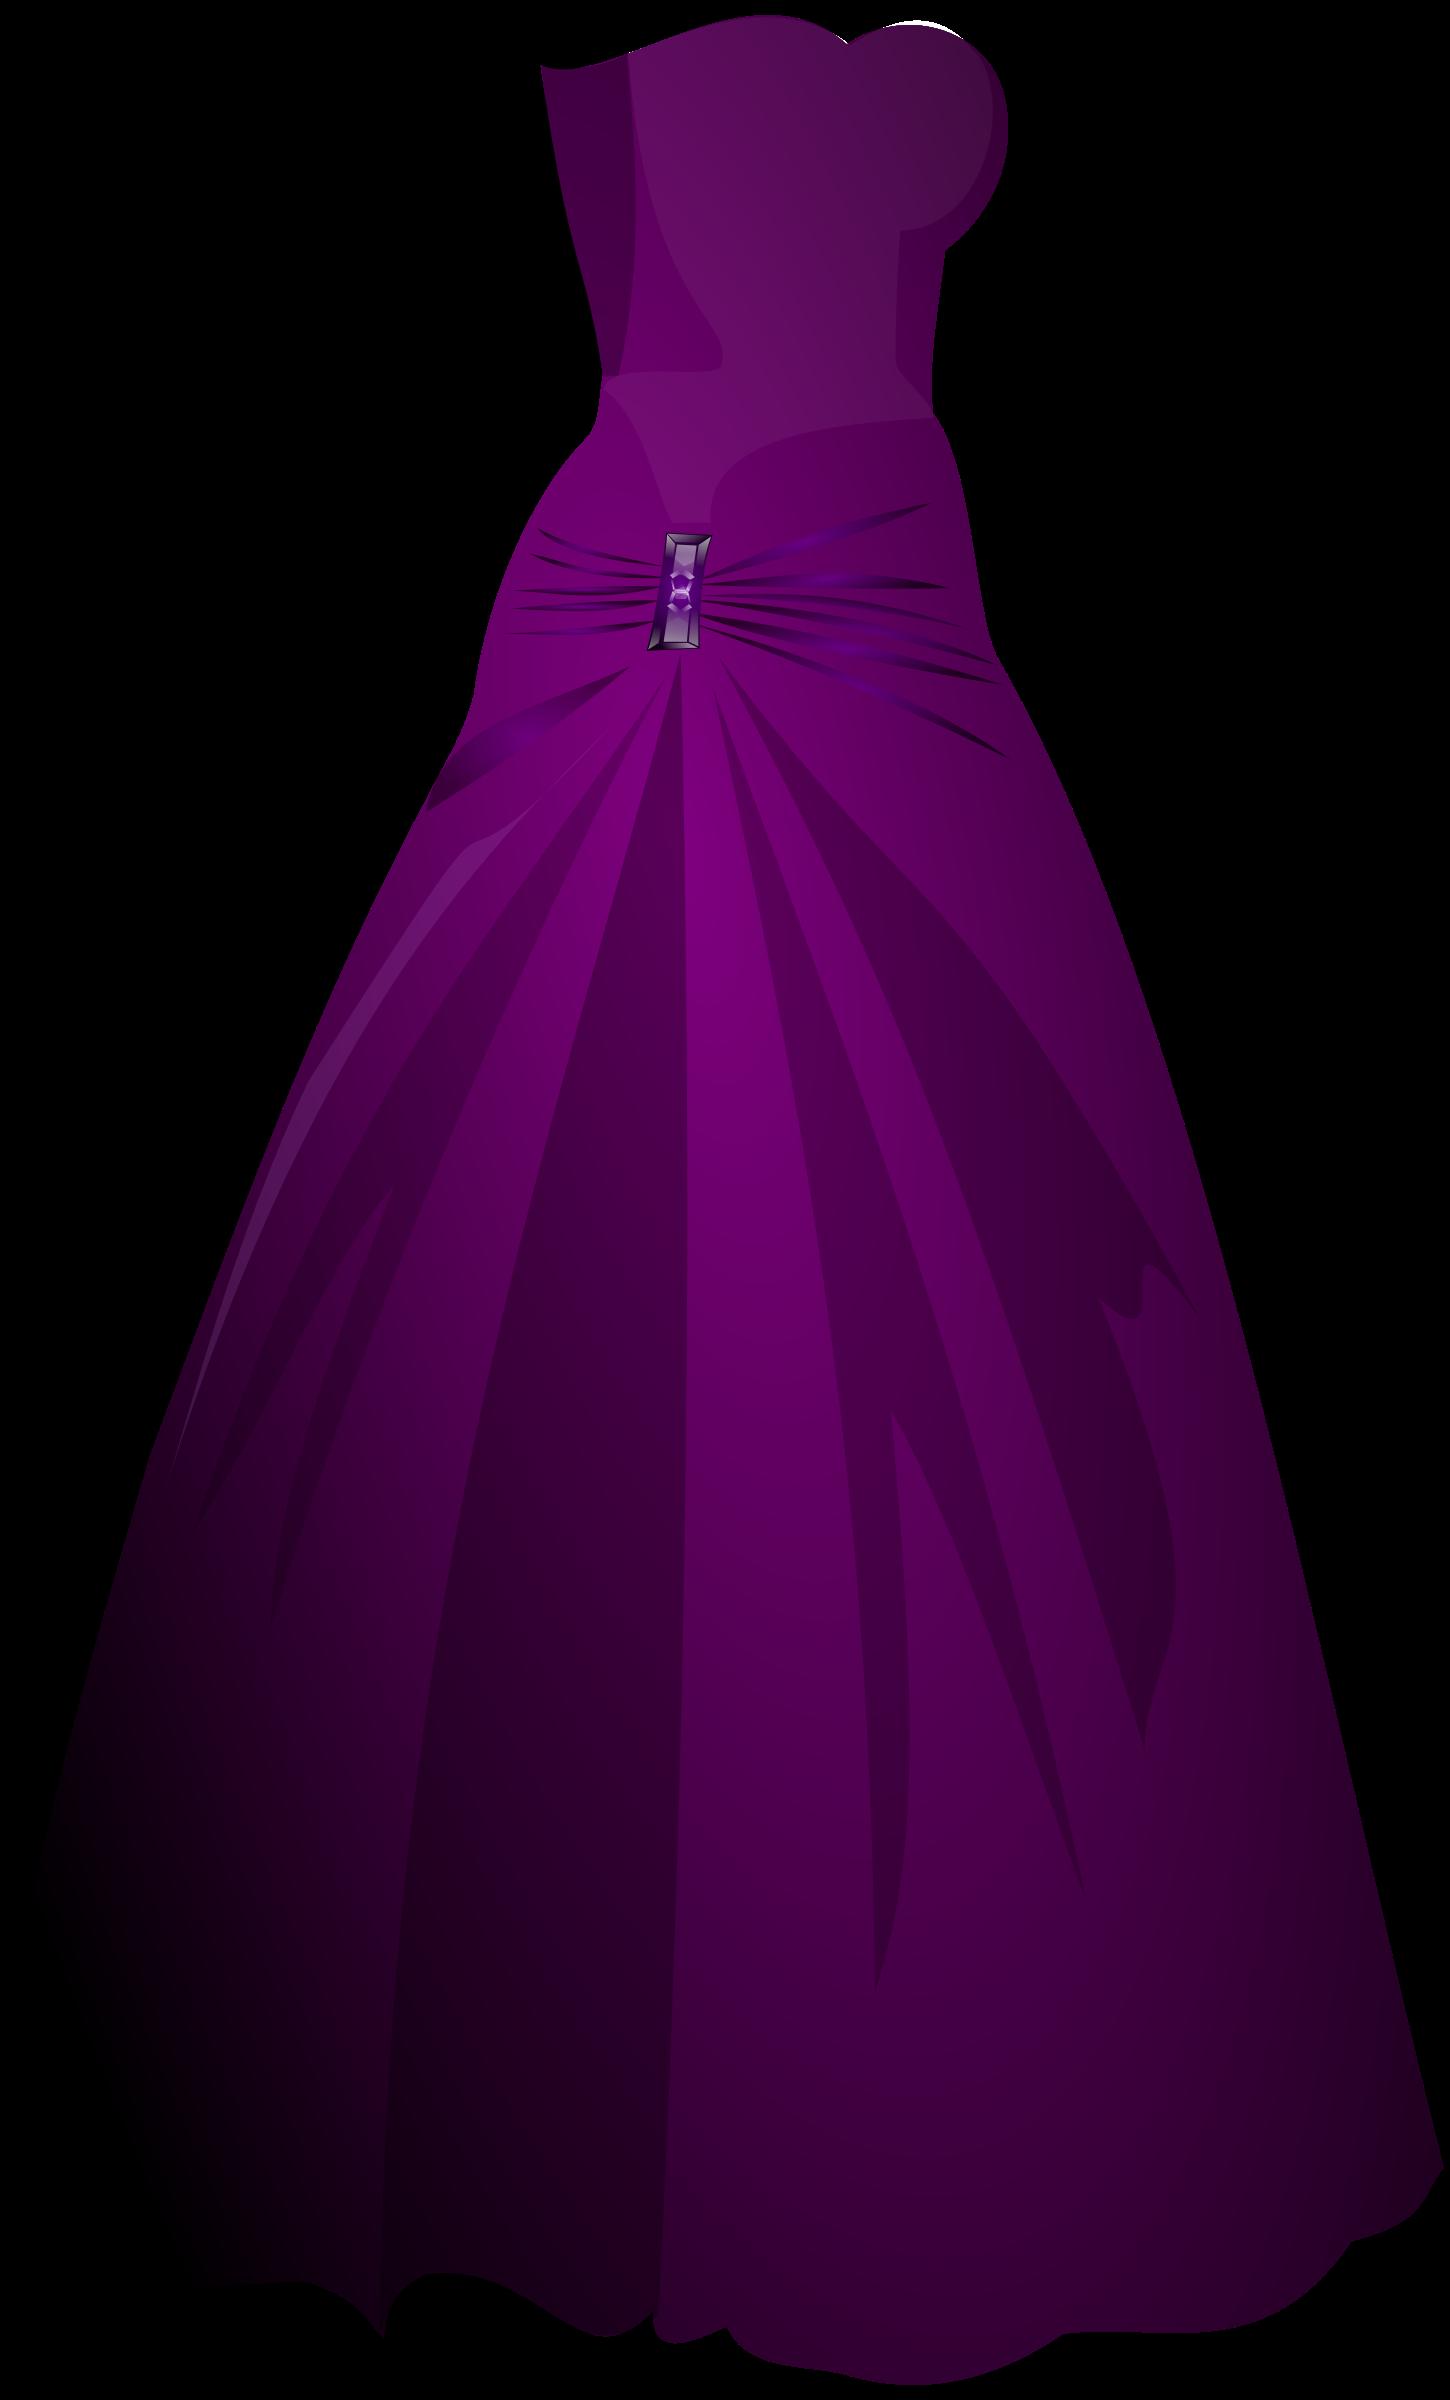 Dress clipart prom dress Dresses Long Clip Art Prom